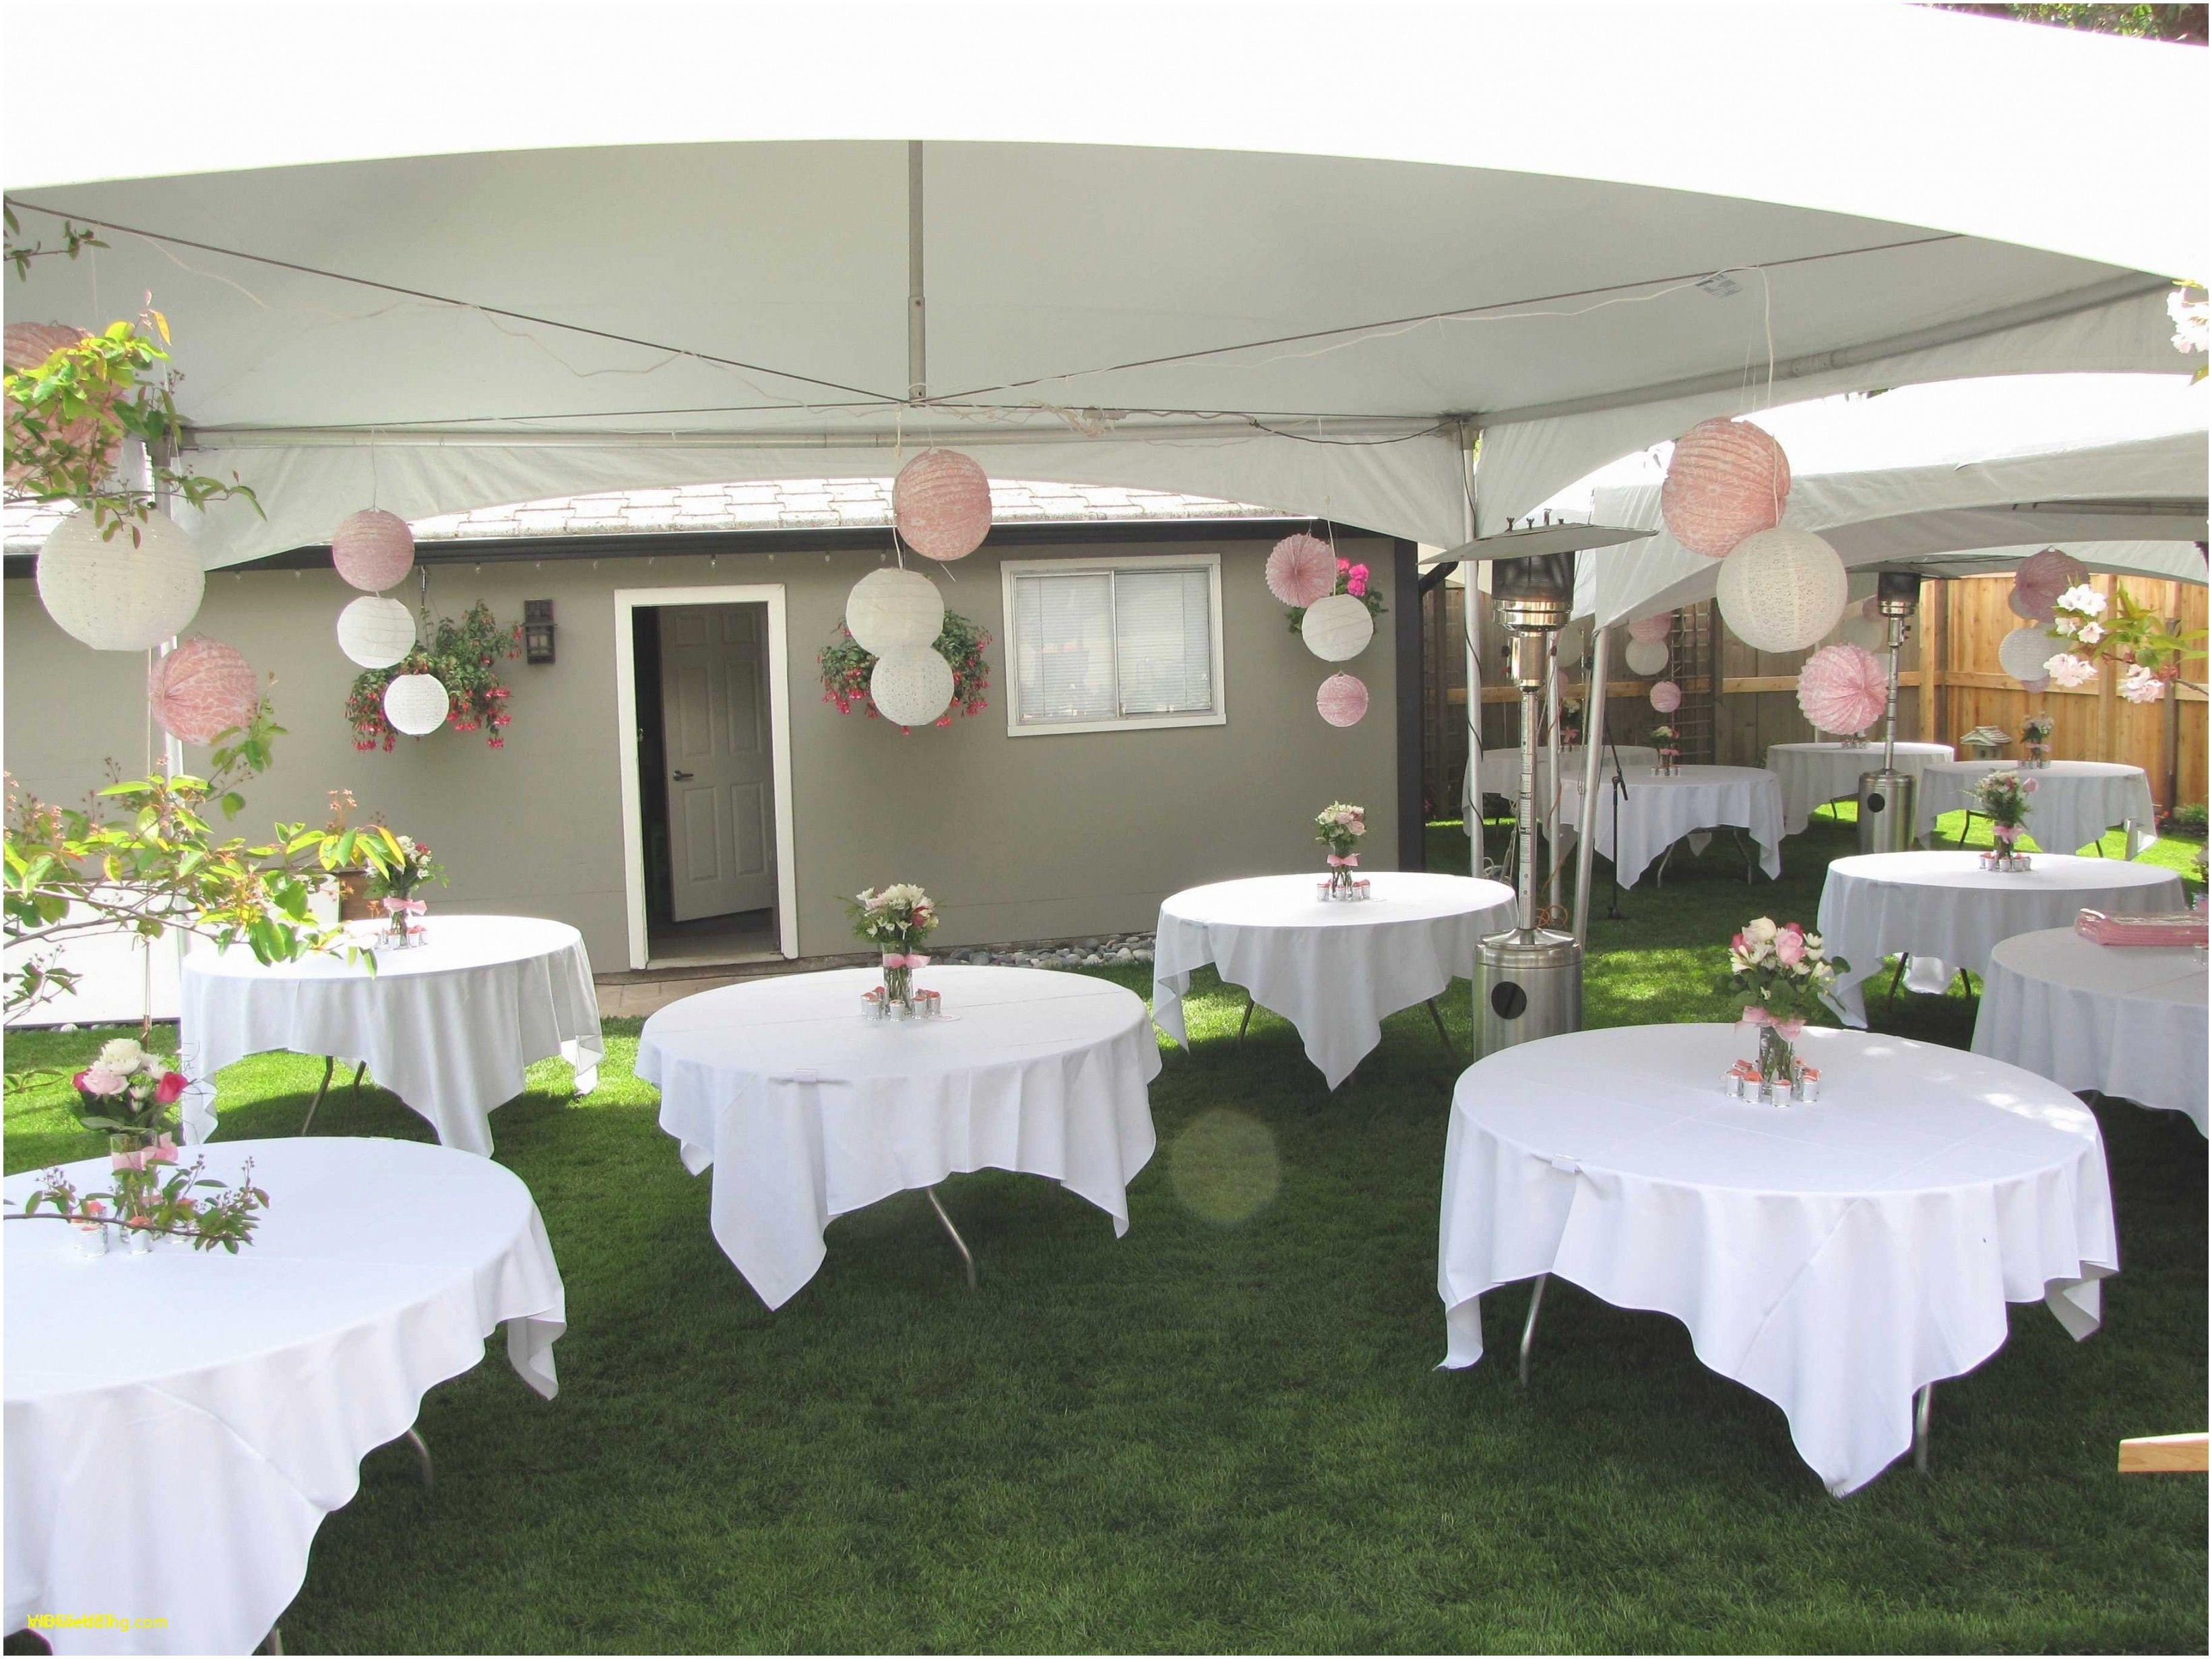 Awesome Simple but Elegant Wedding Decoration Ideas